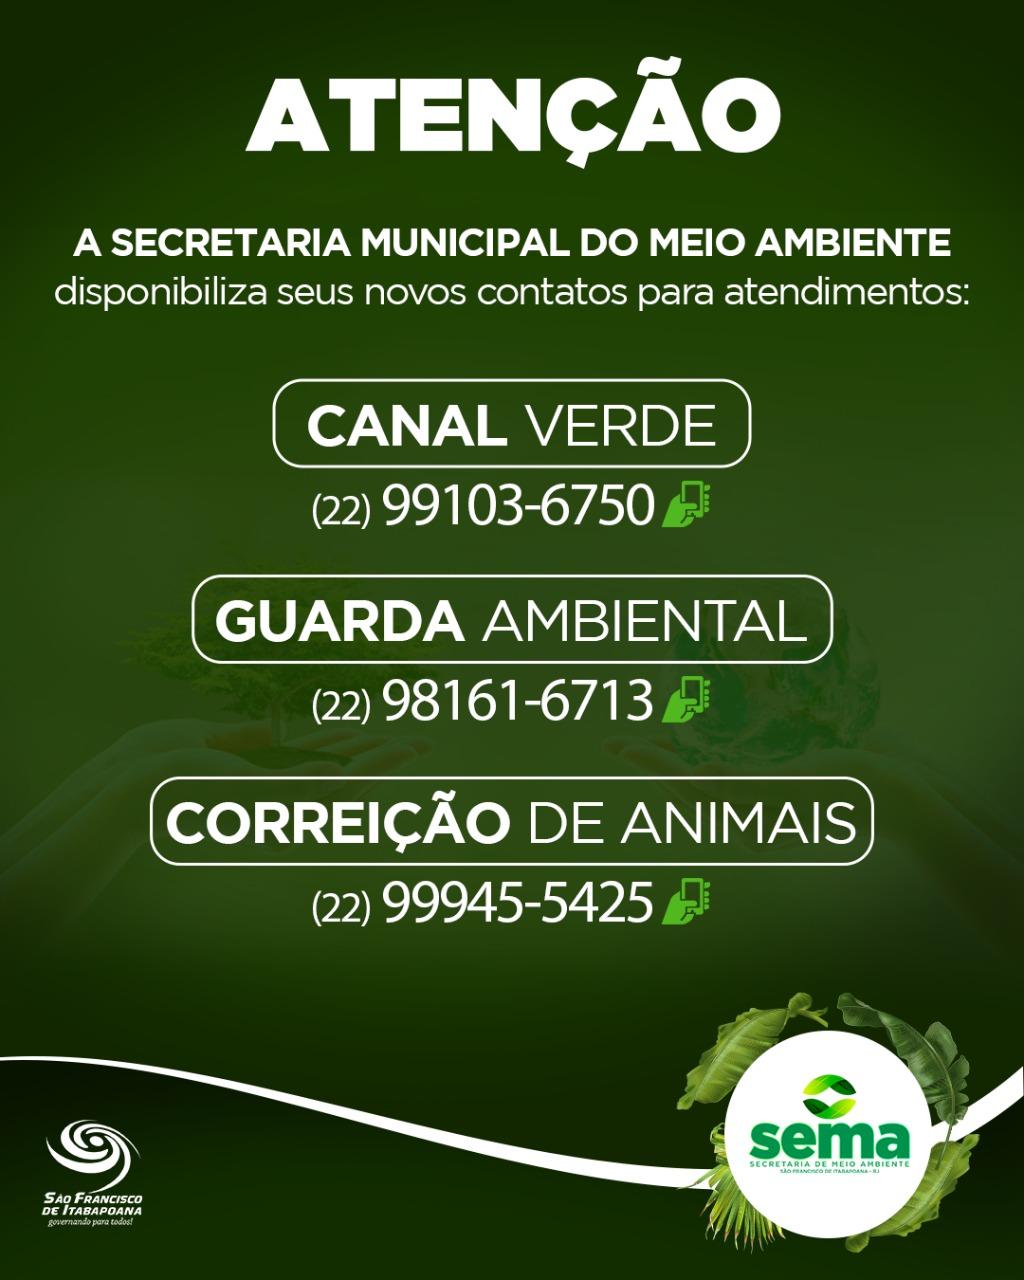 Sema disponibiliza novo contato para o Canal Verde